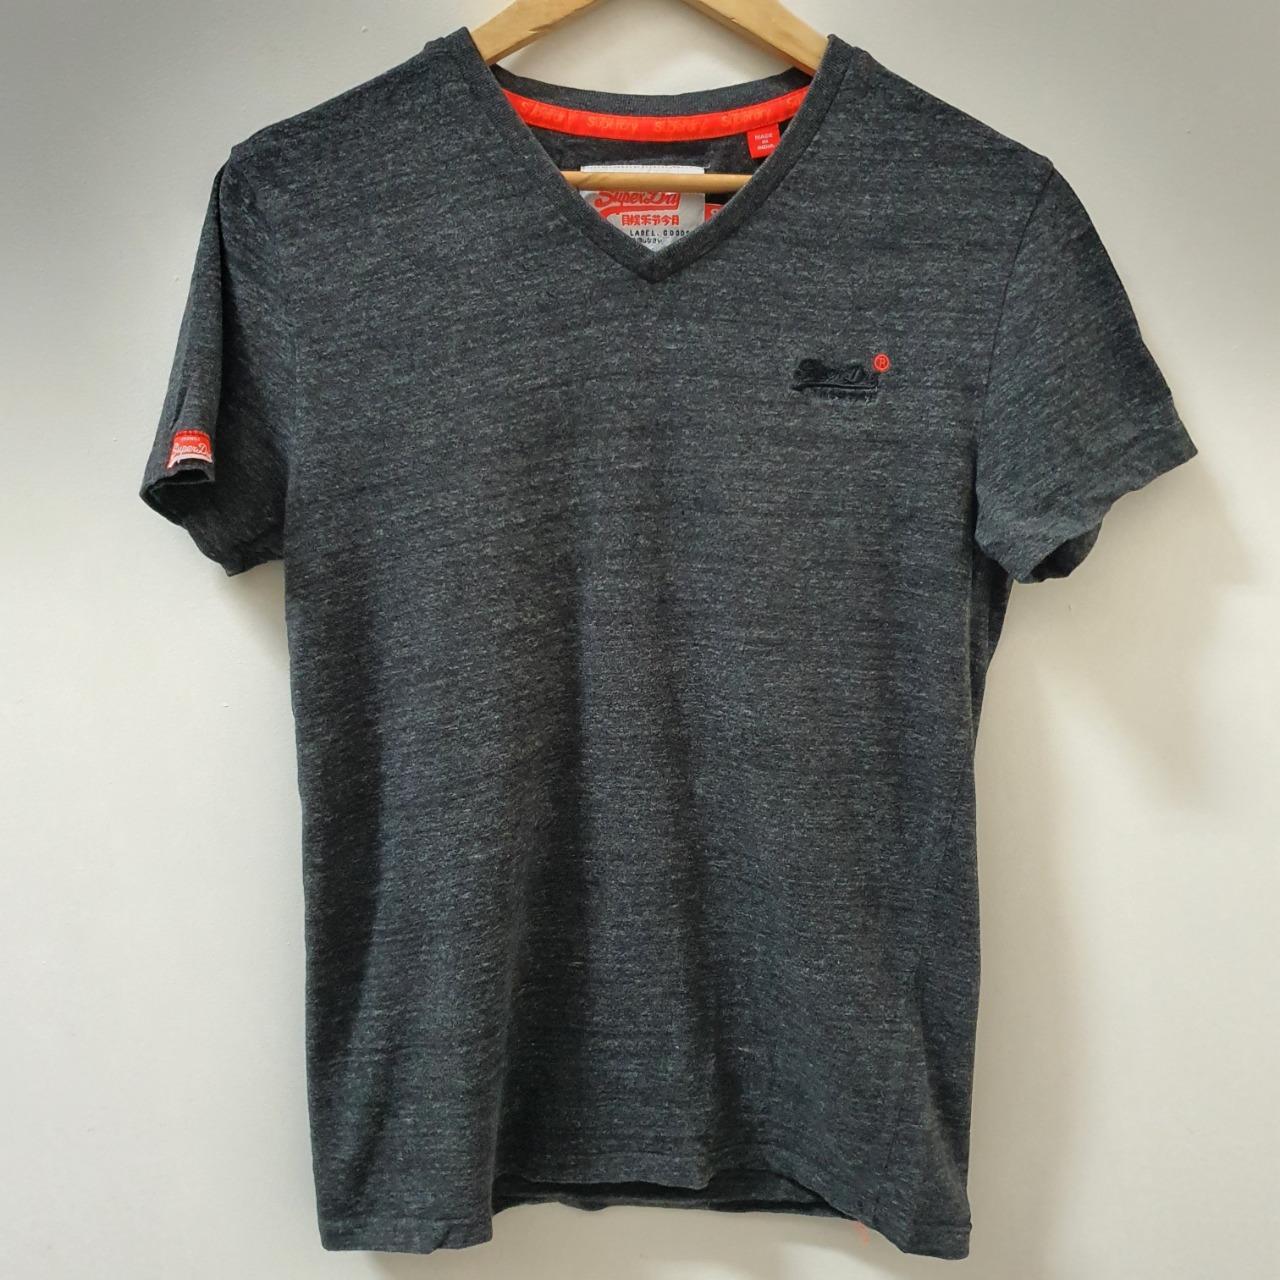 Men's 'Superdry' Black/Dark Grey T-Shirt - Size S